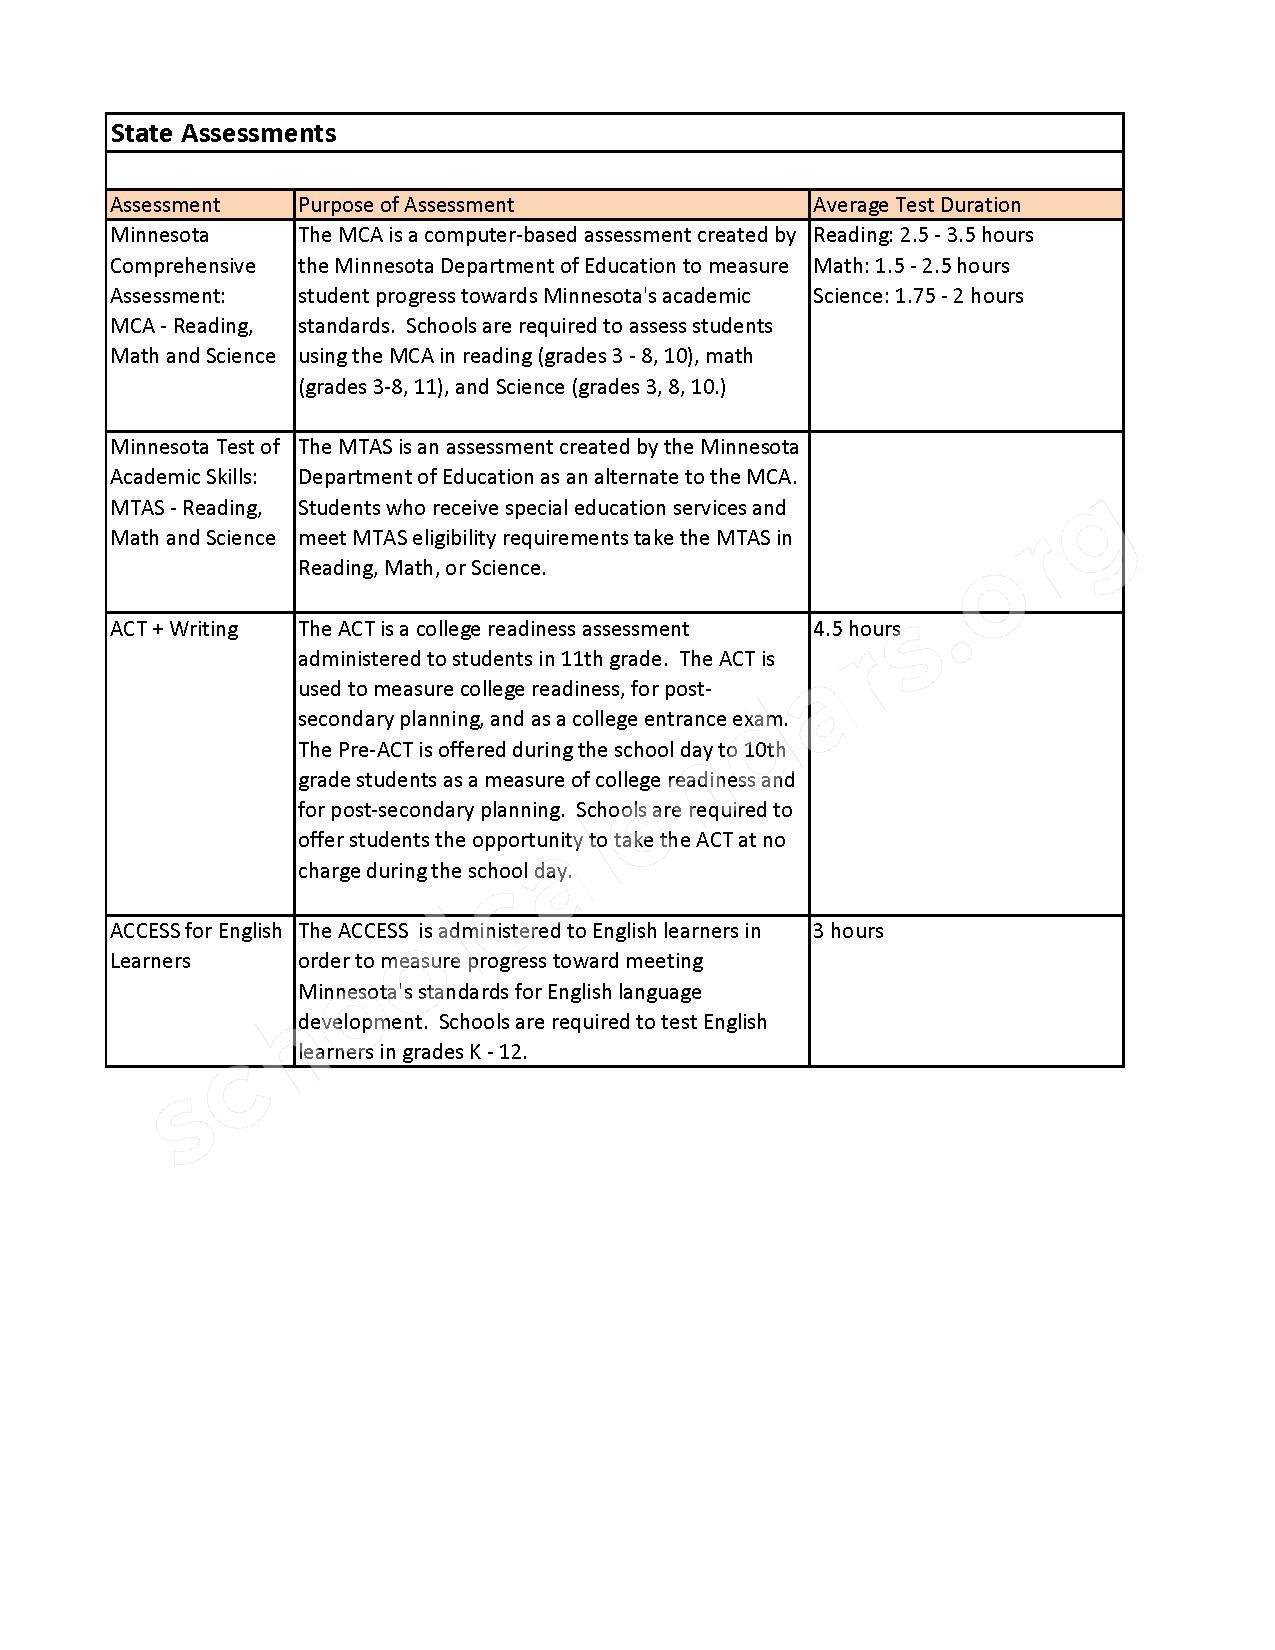 2016 - 2017 District Assessment Calendar – White Bear Lake School District – page 3